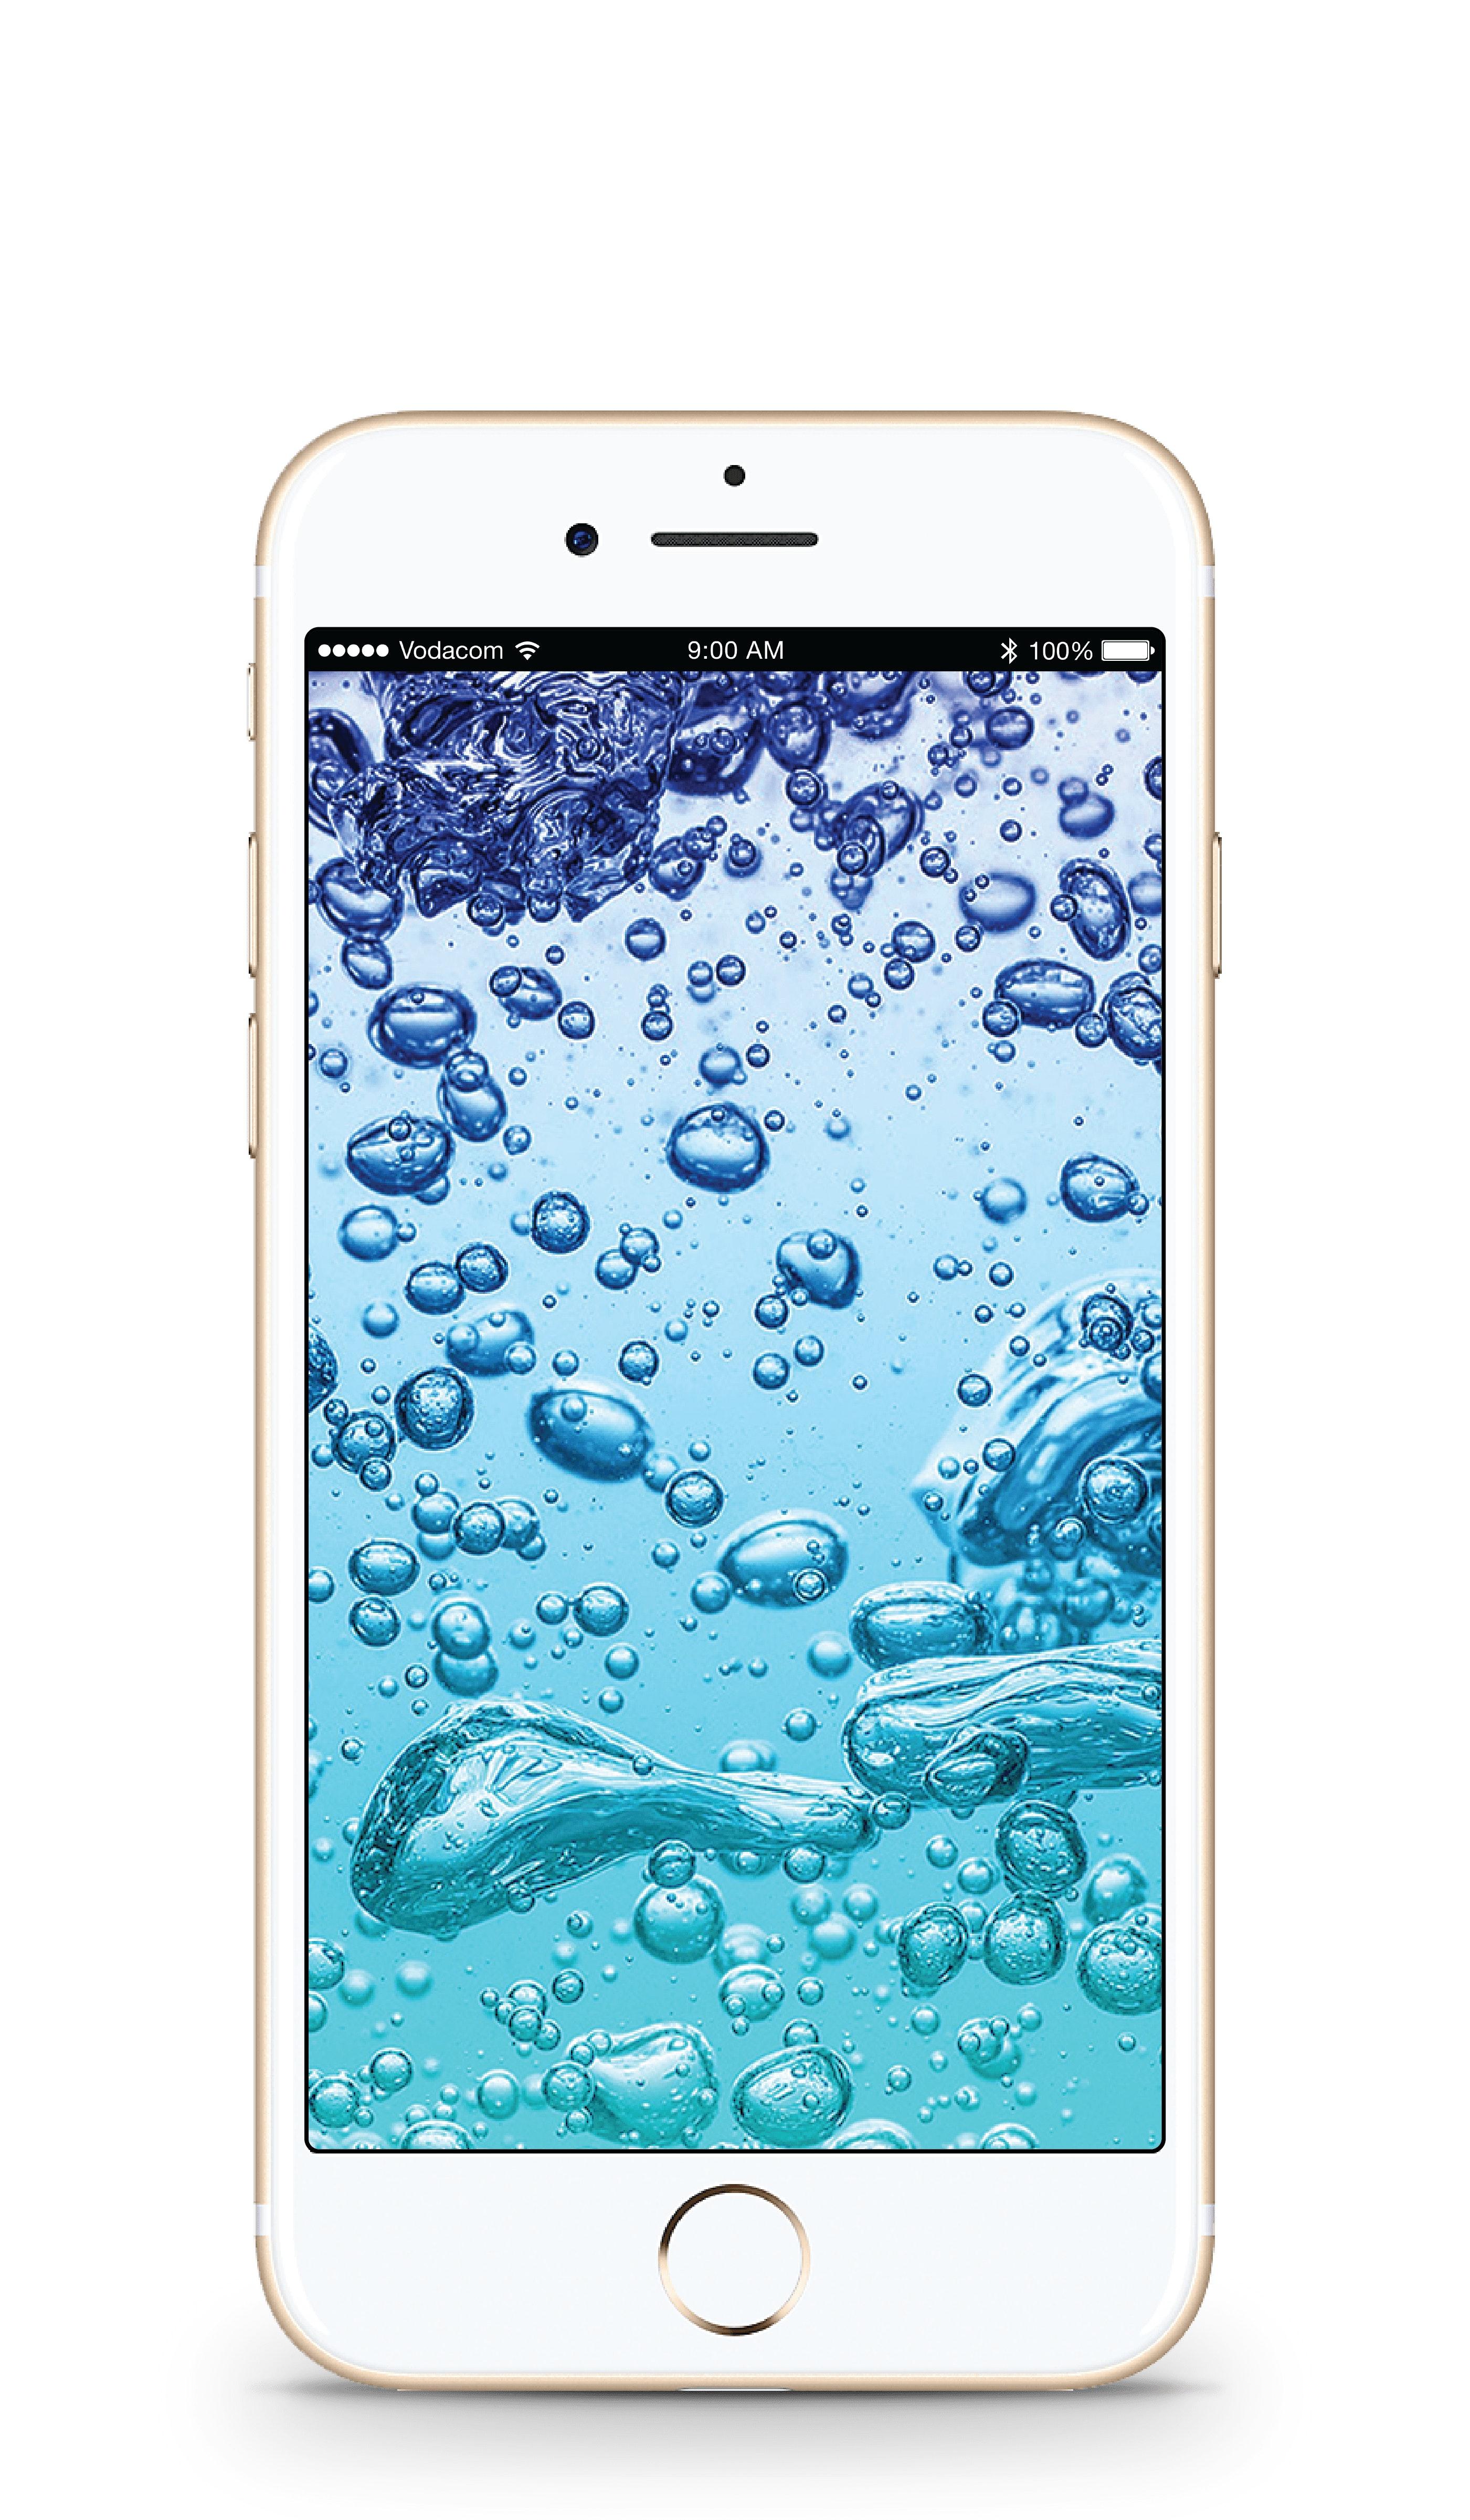 Apple iPhone 7 image